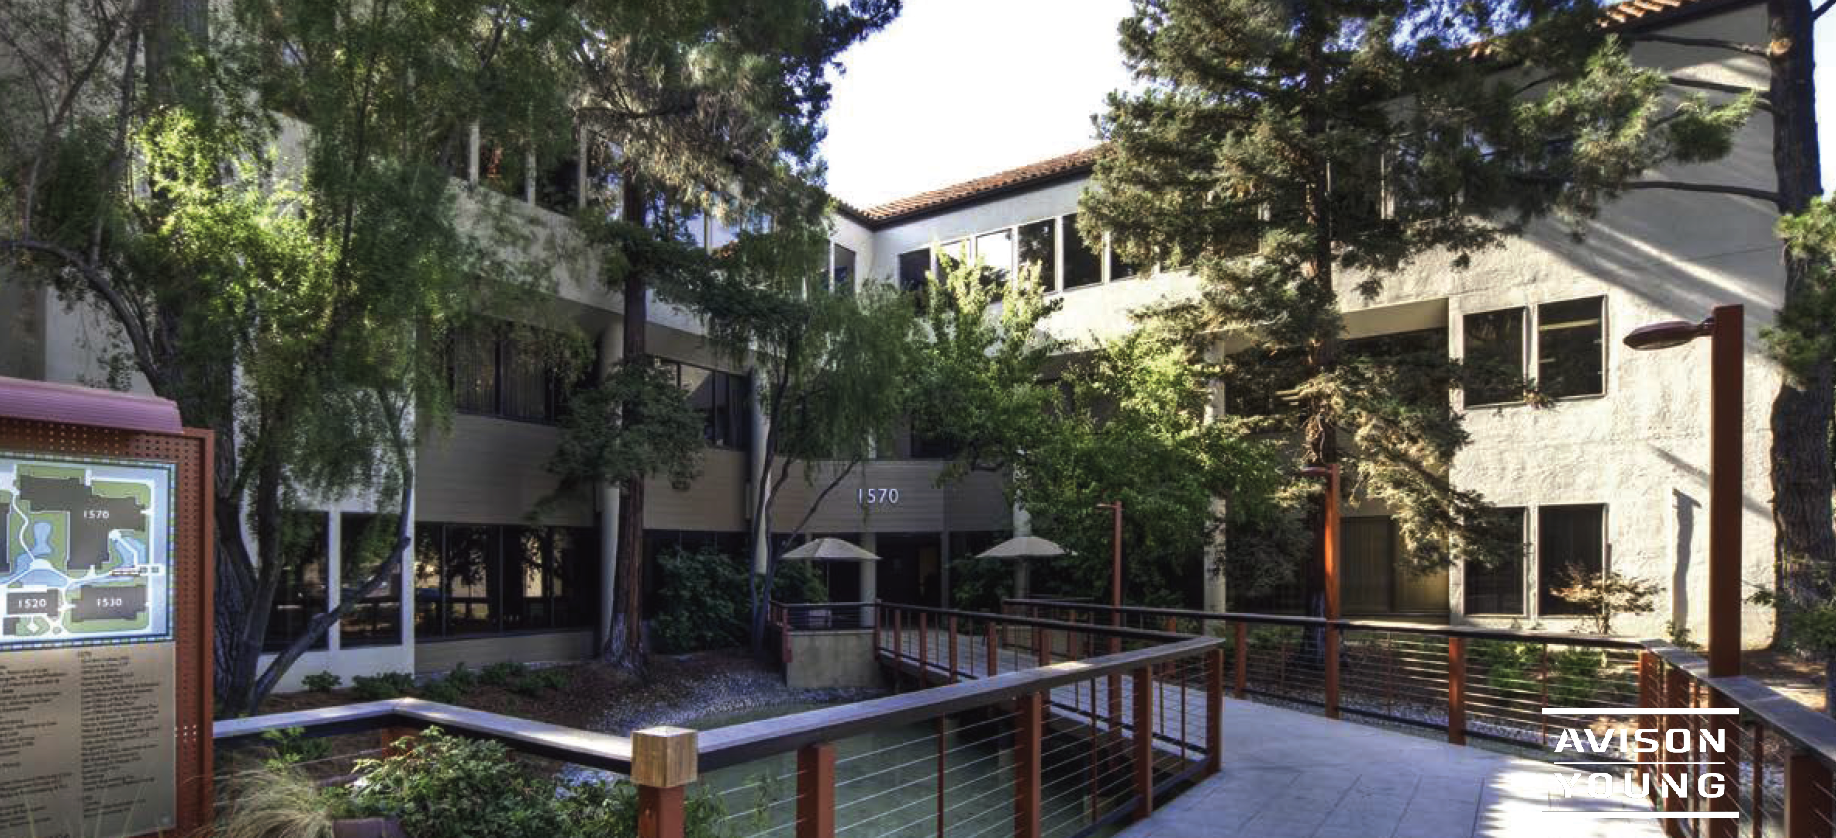 The Garden Alameda<br/><div>1520-1590 The Alameda</div><div>San Jose, CA 95126</div>